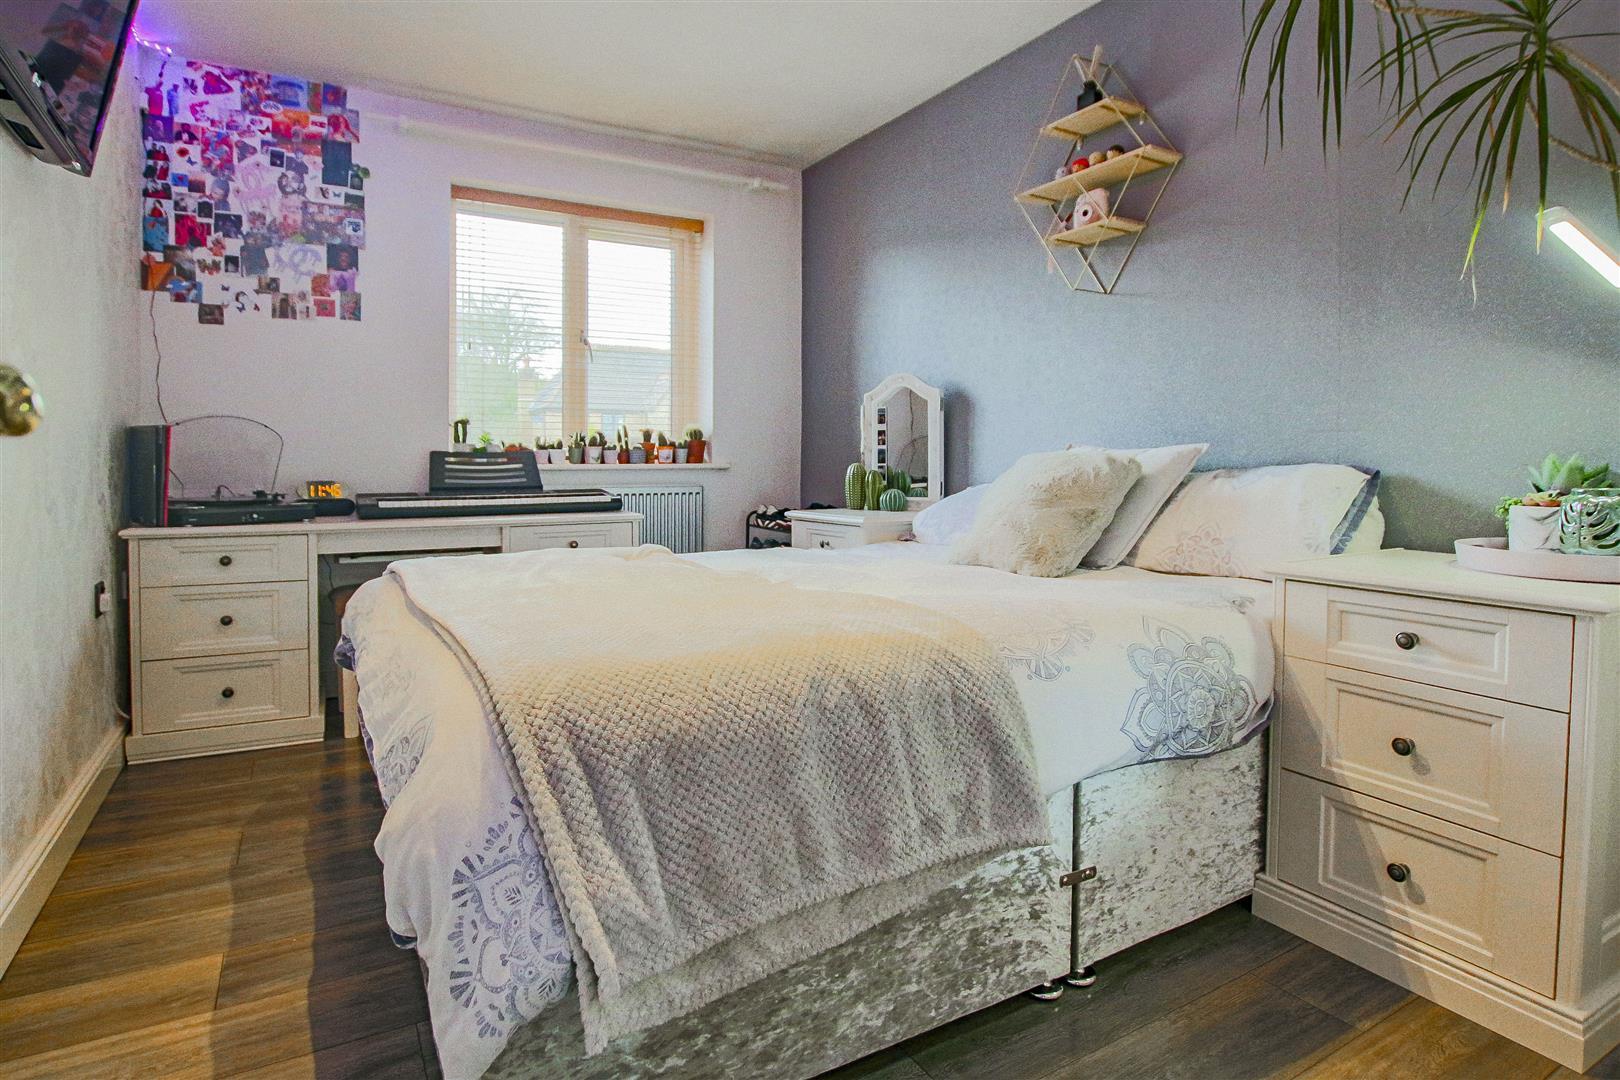 4 Bedroom Detached House For Sale - redwing31777.JPG